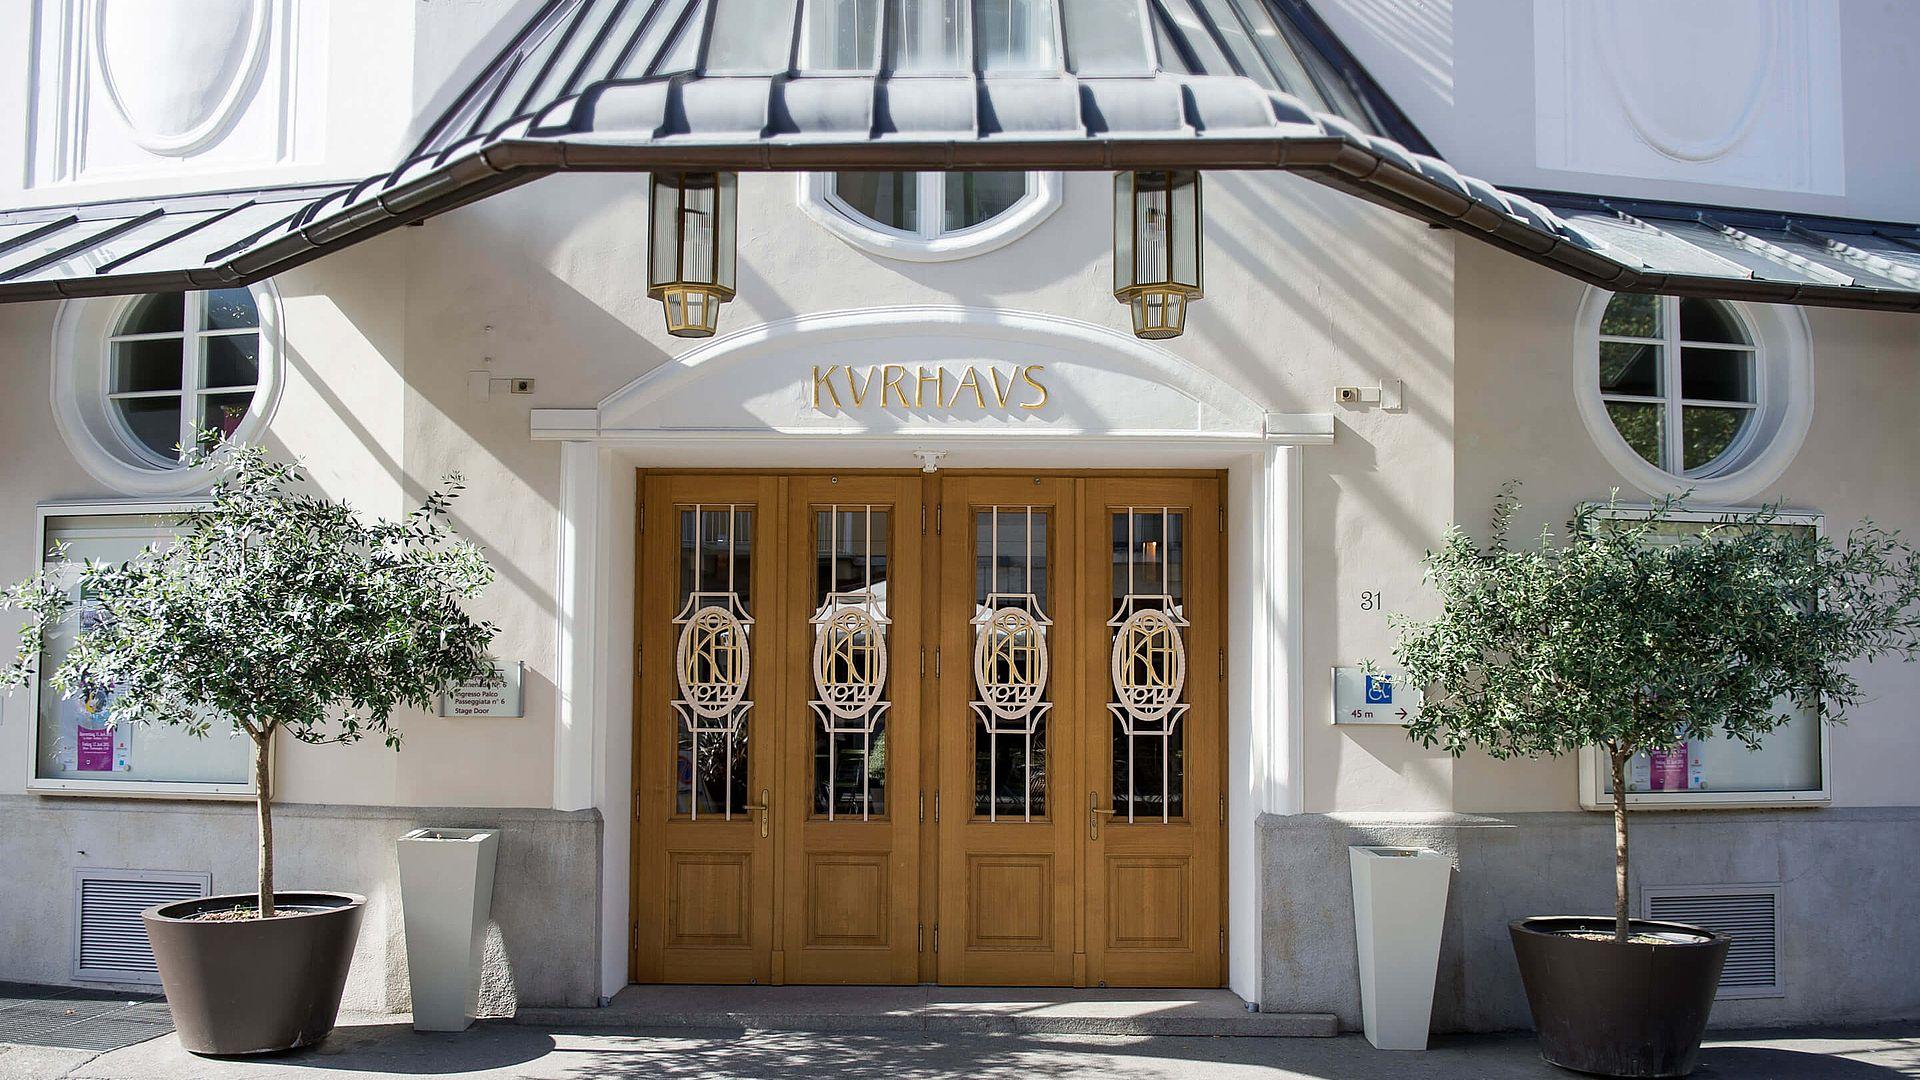 Charmantes 4 Sterne Hotel In Meran